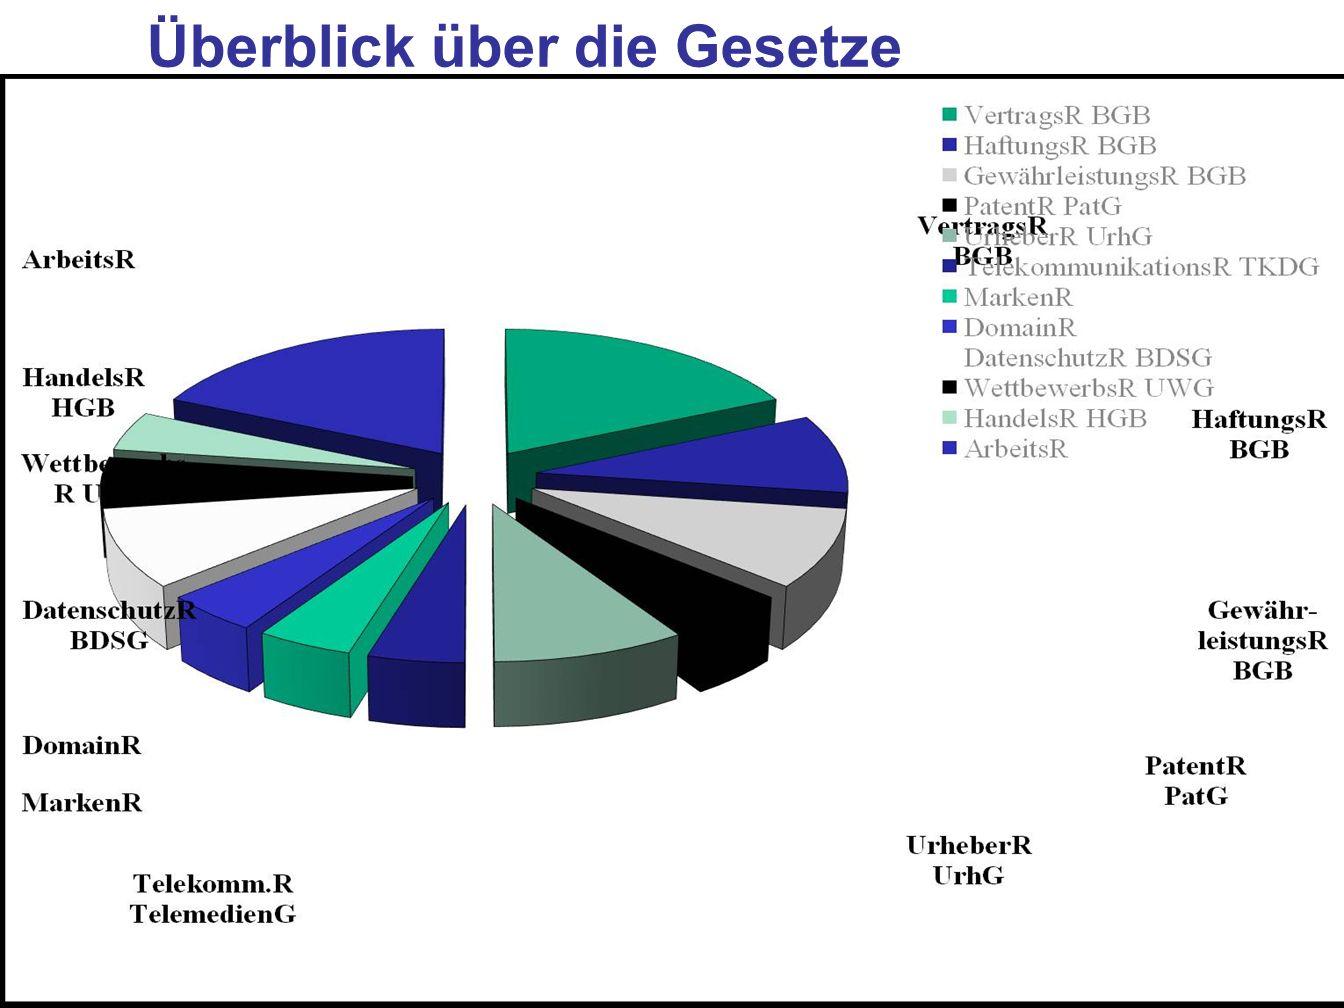 3 Niko Härting, Internetrecht, 2.Aufl. Köln 2005.